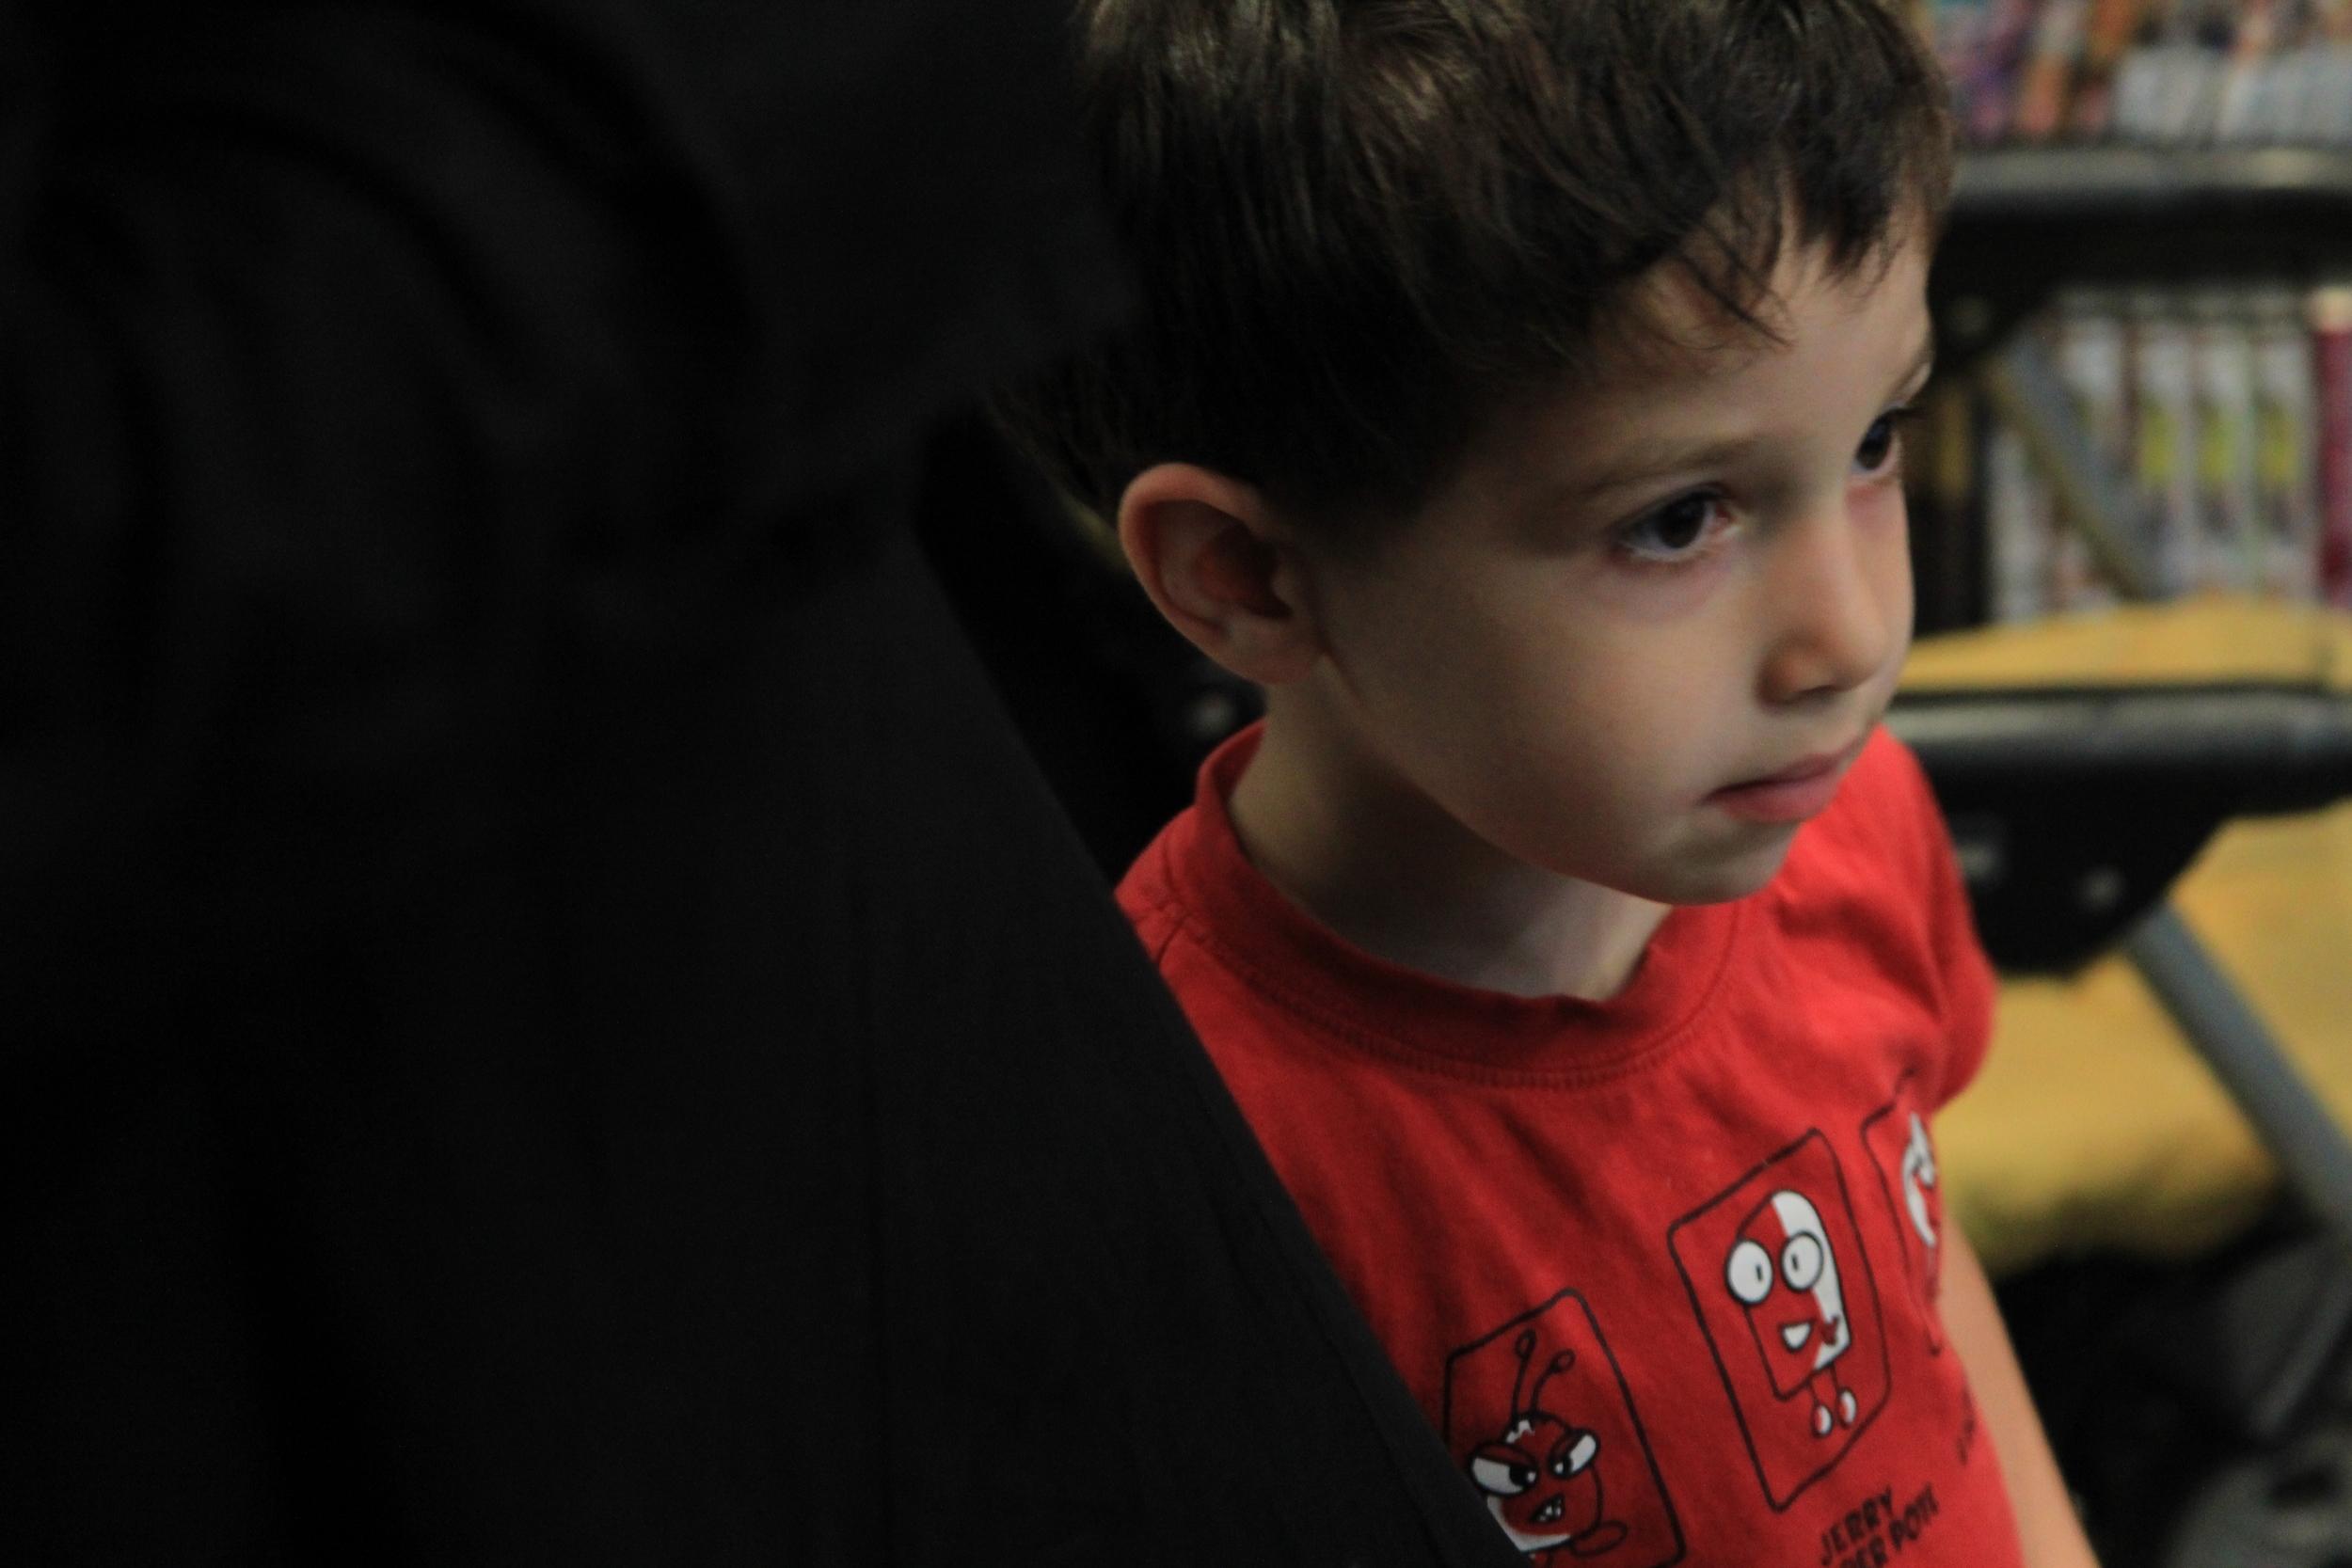 A young spectator at Le comptoir des mots. Photo: Dan Gunn.